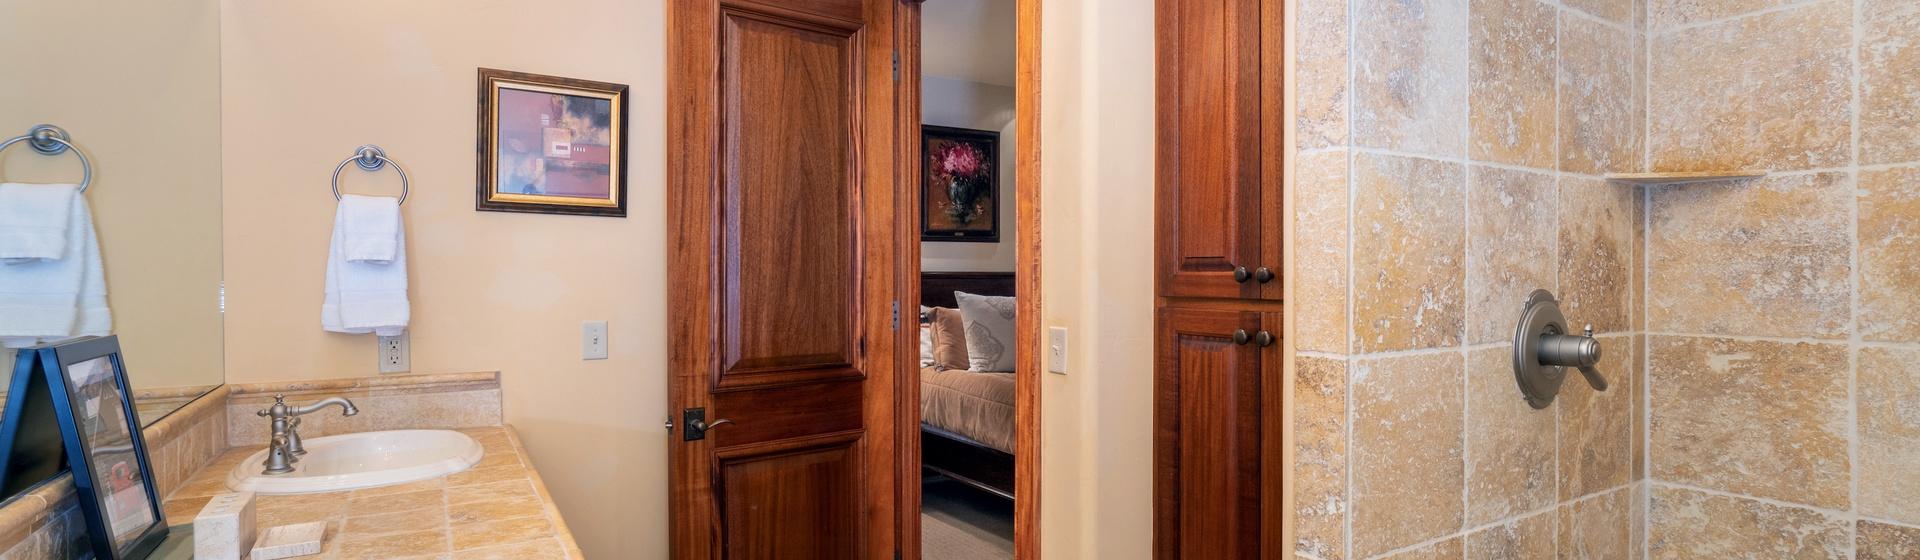 2.07-telluride-tres-casas-B-guest-bathroom-web.jpg